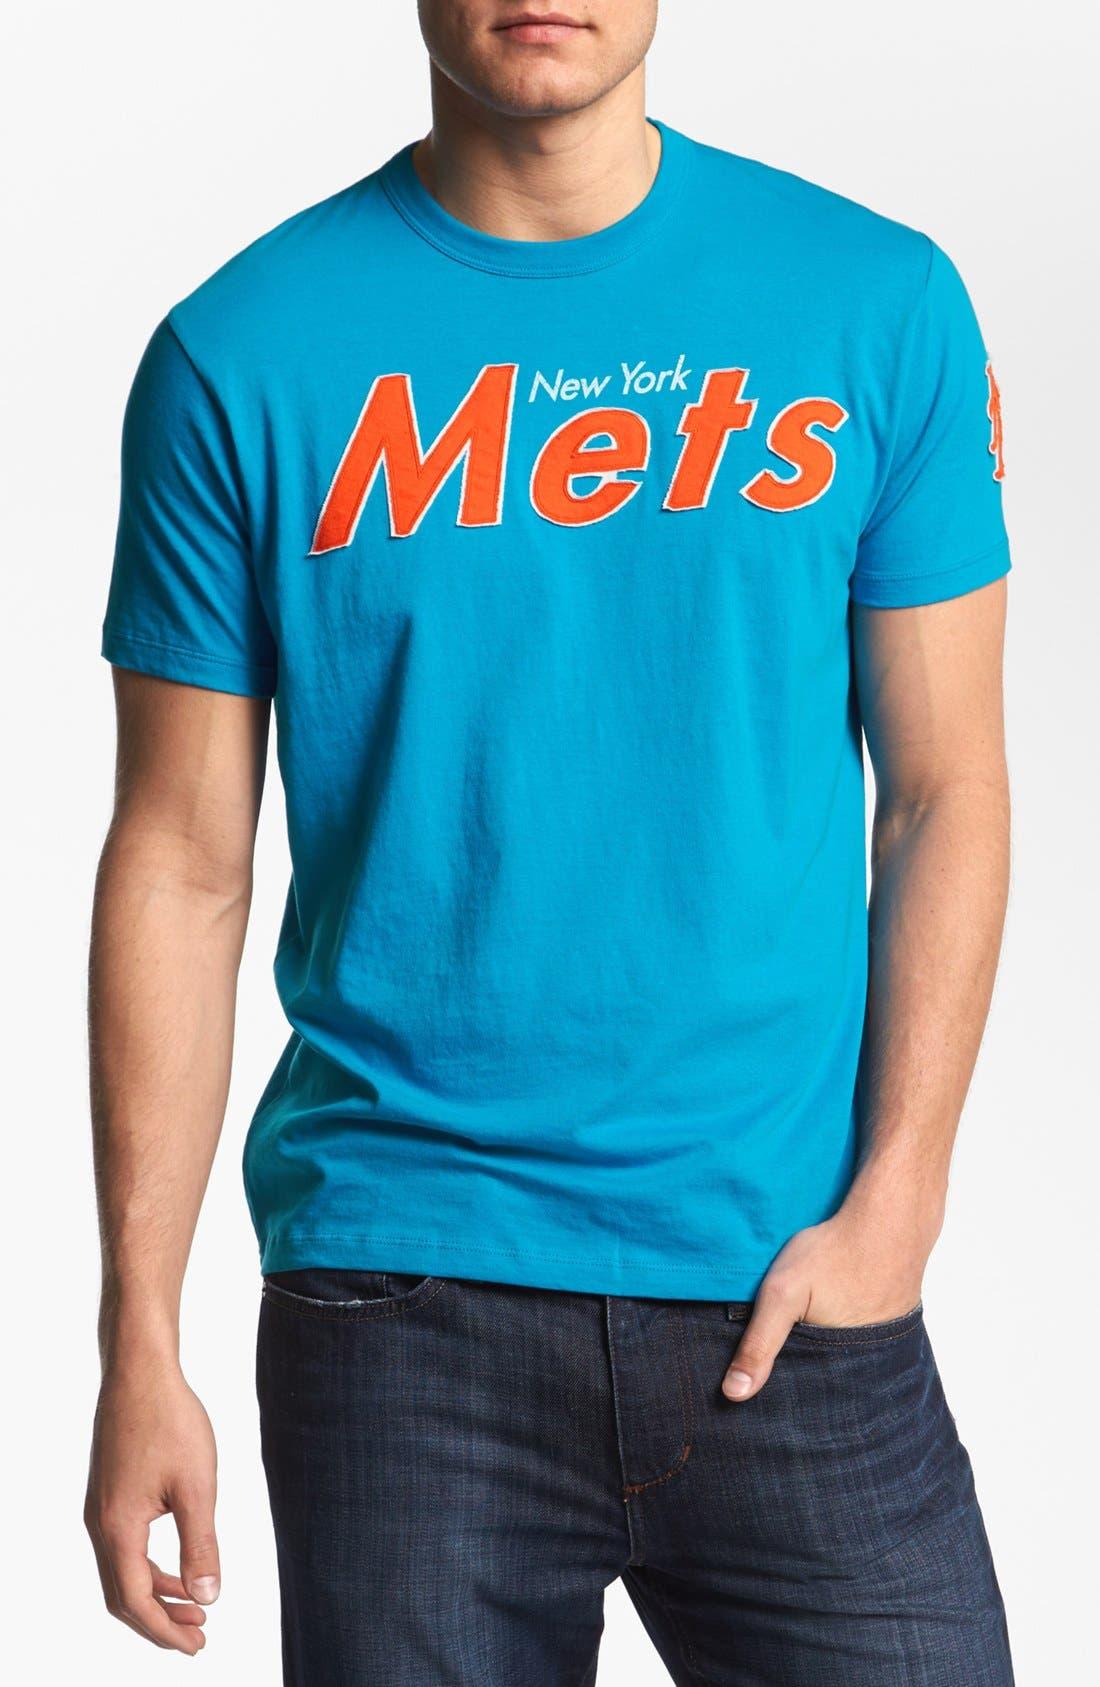 Main Image - 47 Brand 'New York Mets - Fieldhouse' T-Shirt